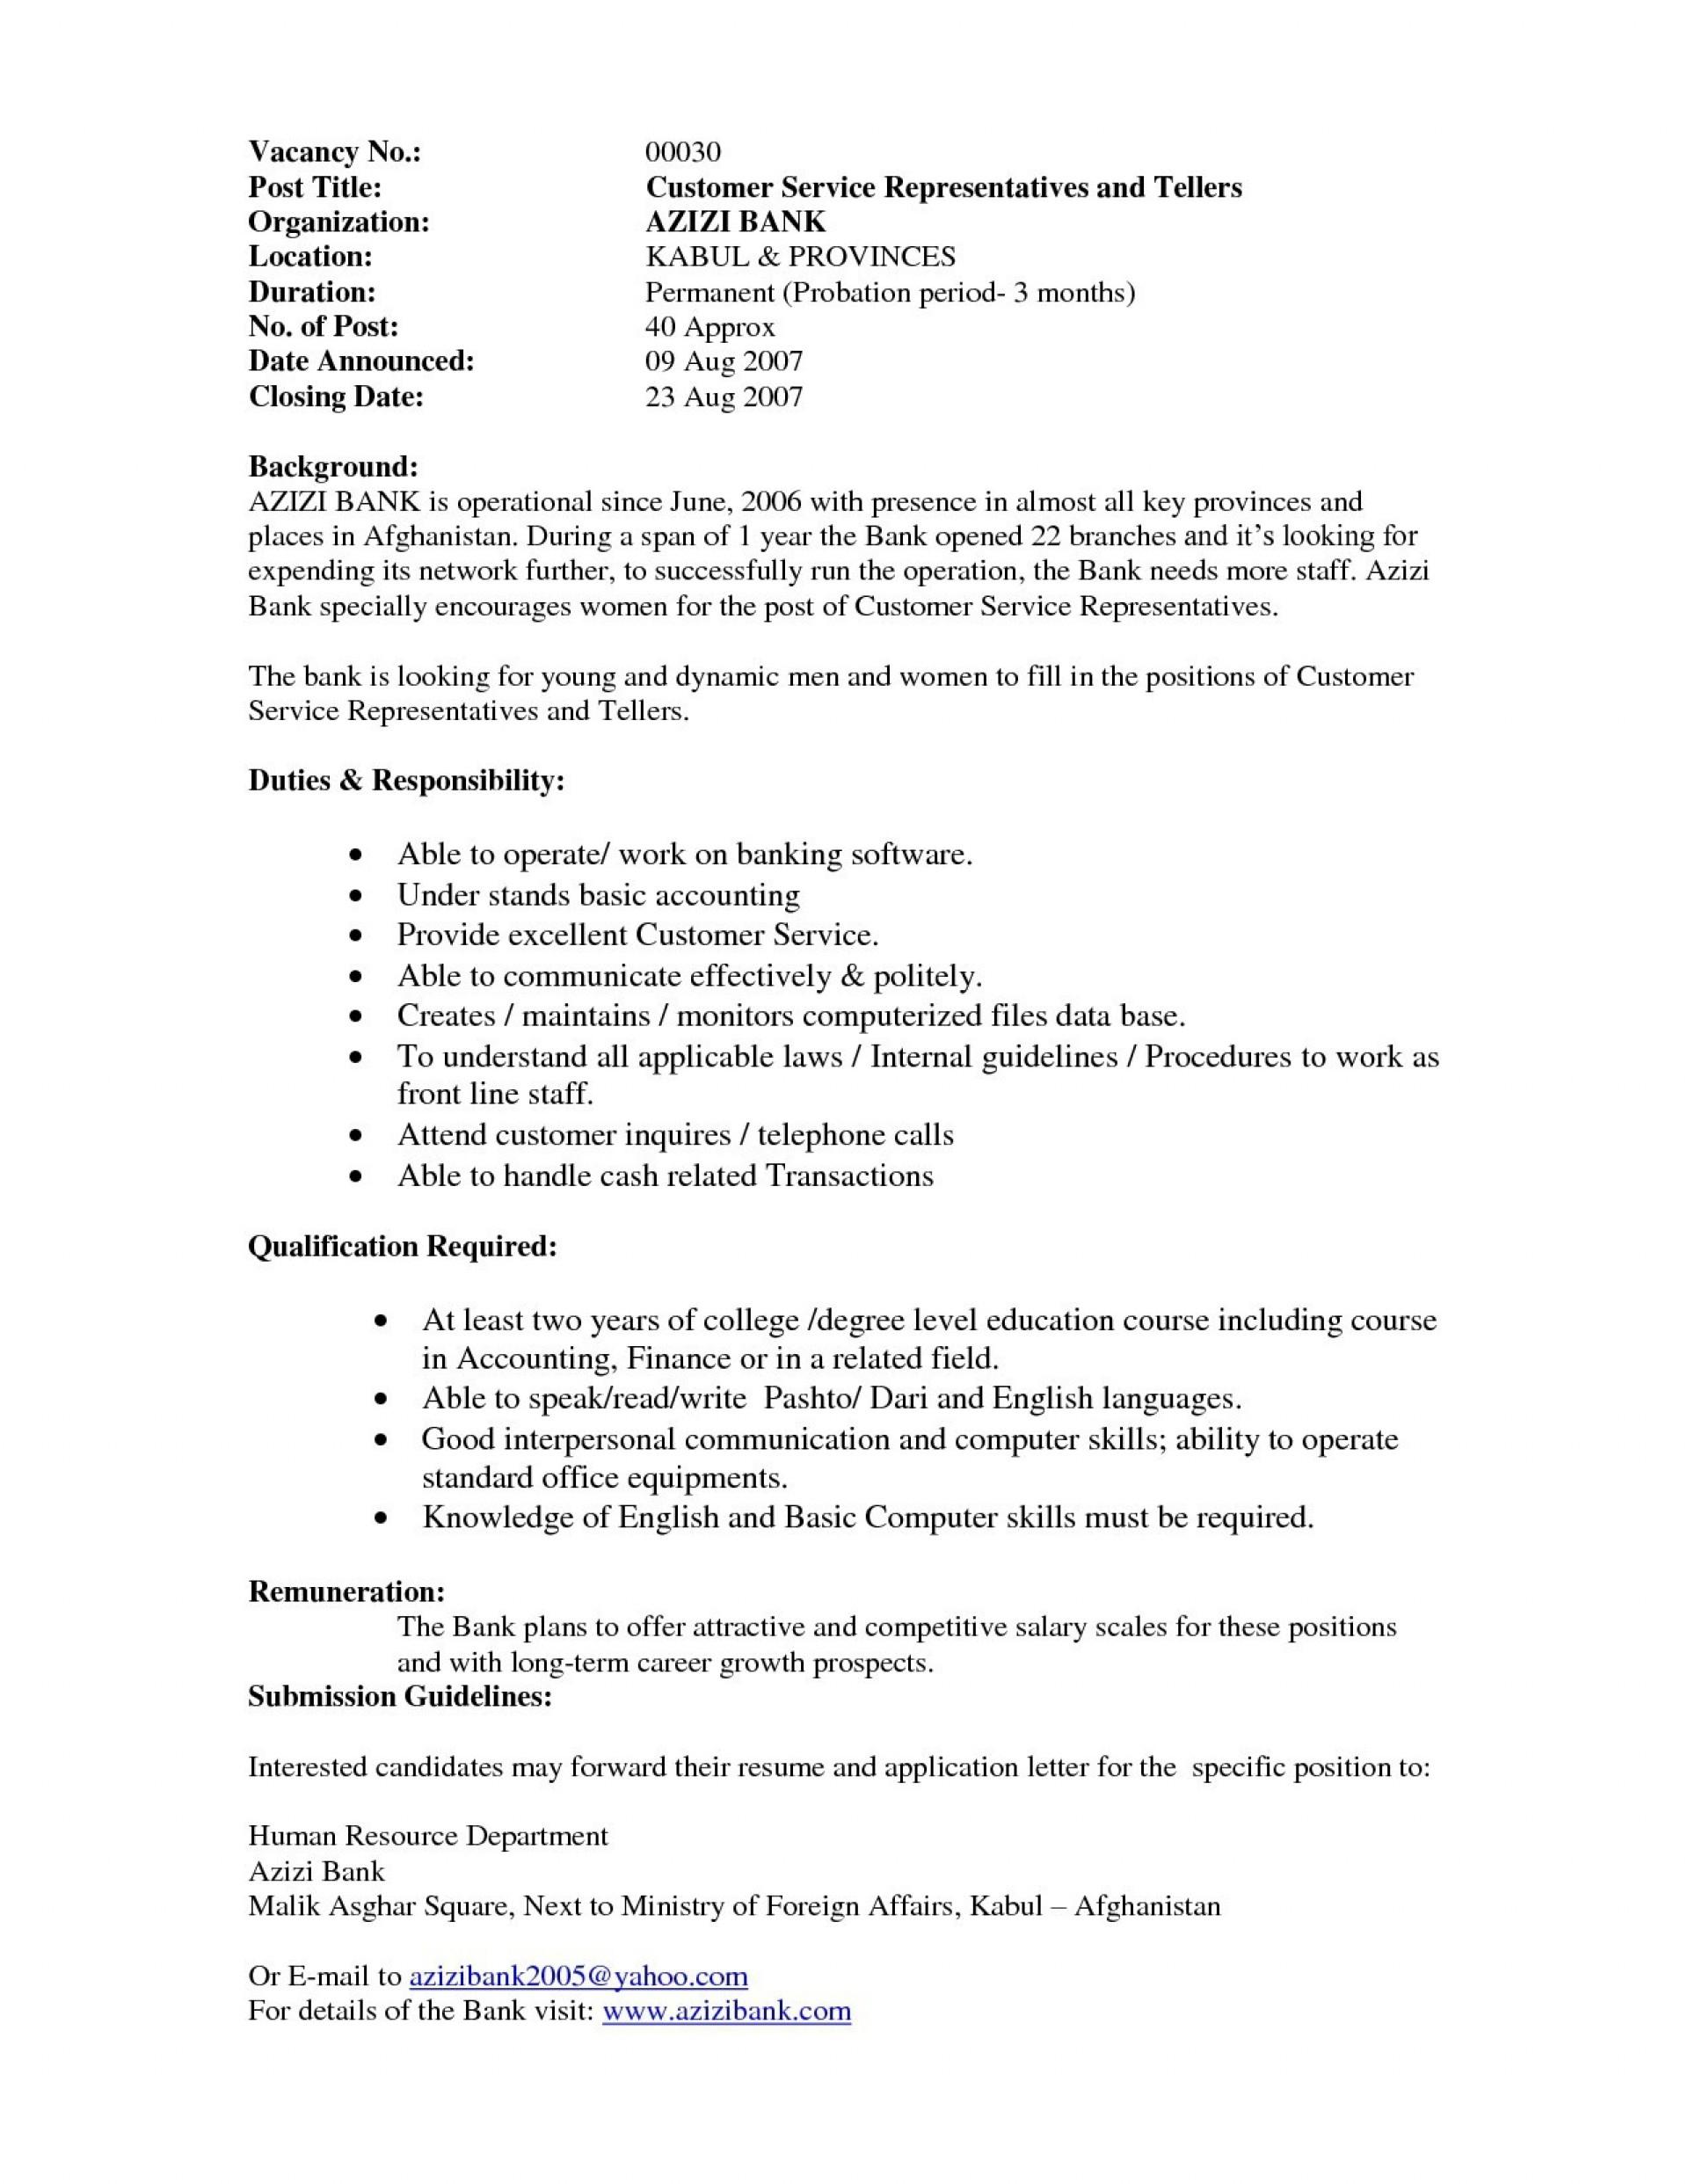 Printable Pharmacy Technician Math Worksheets